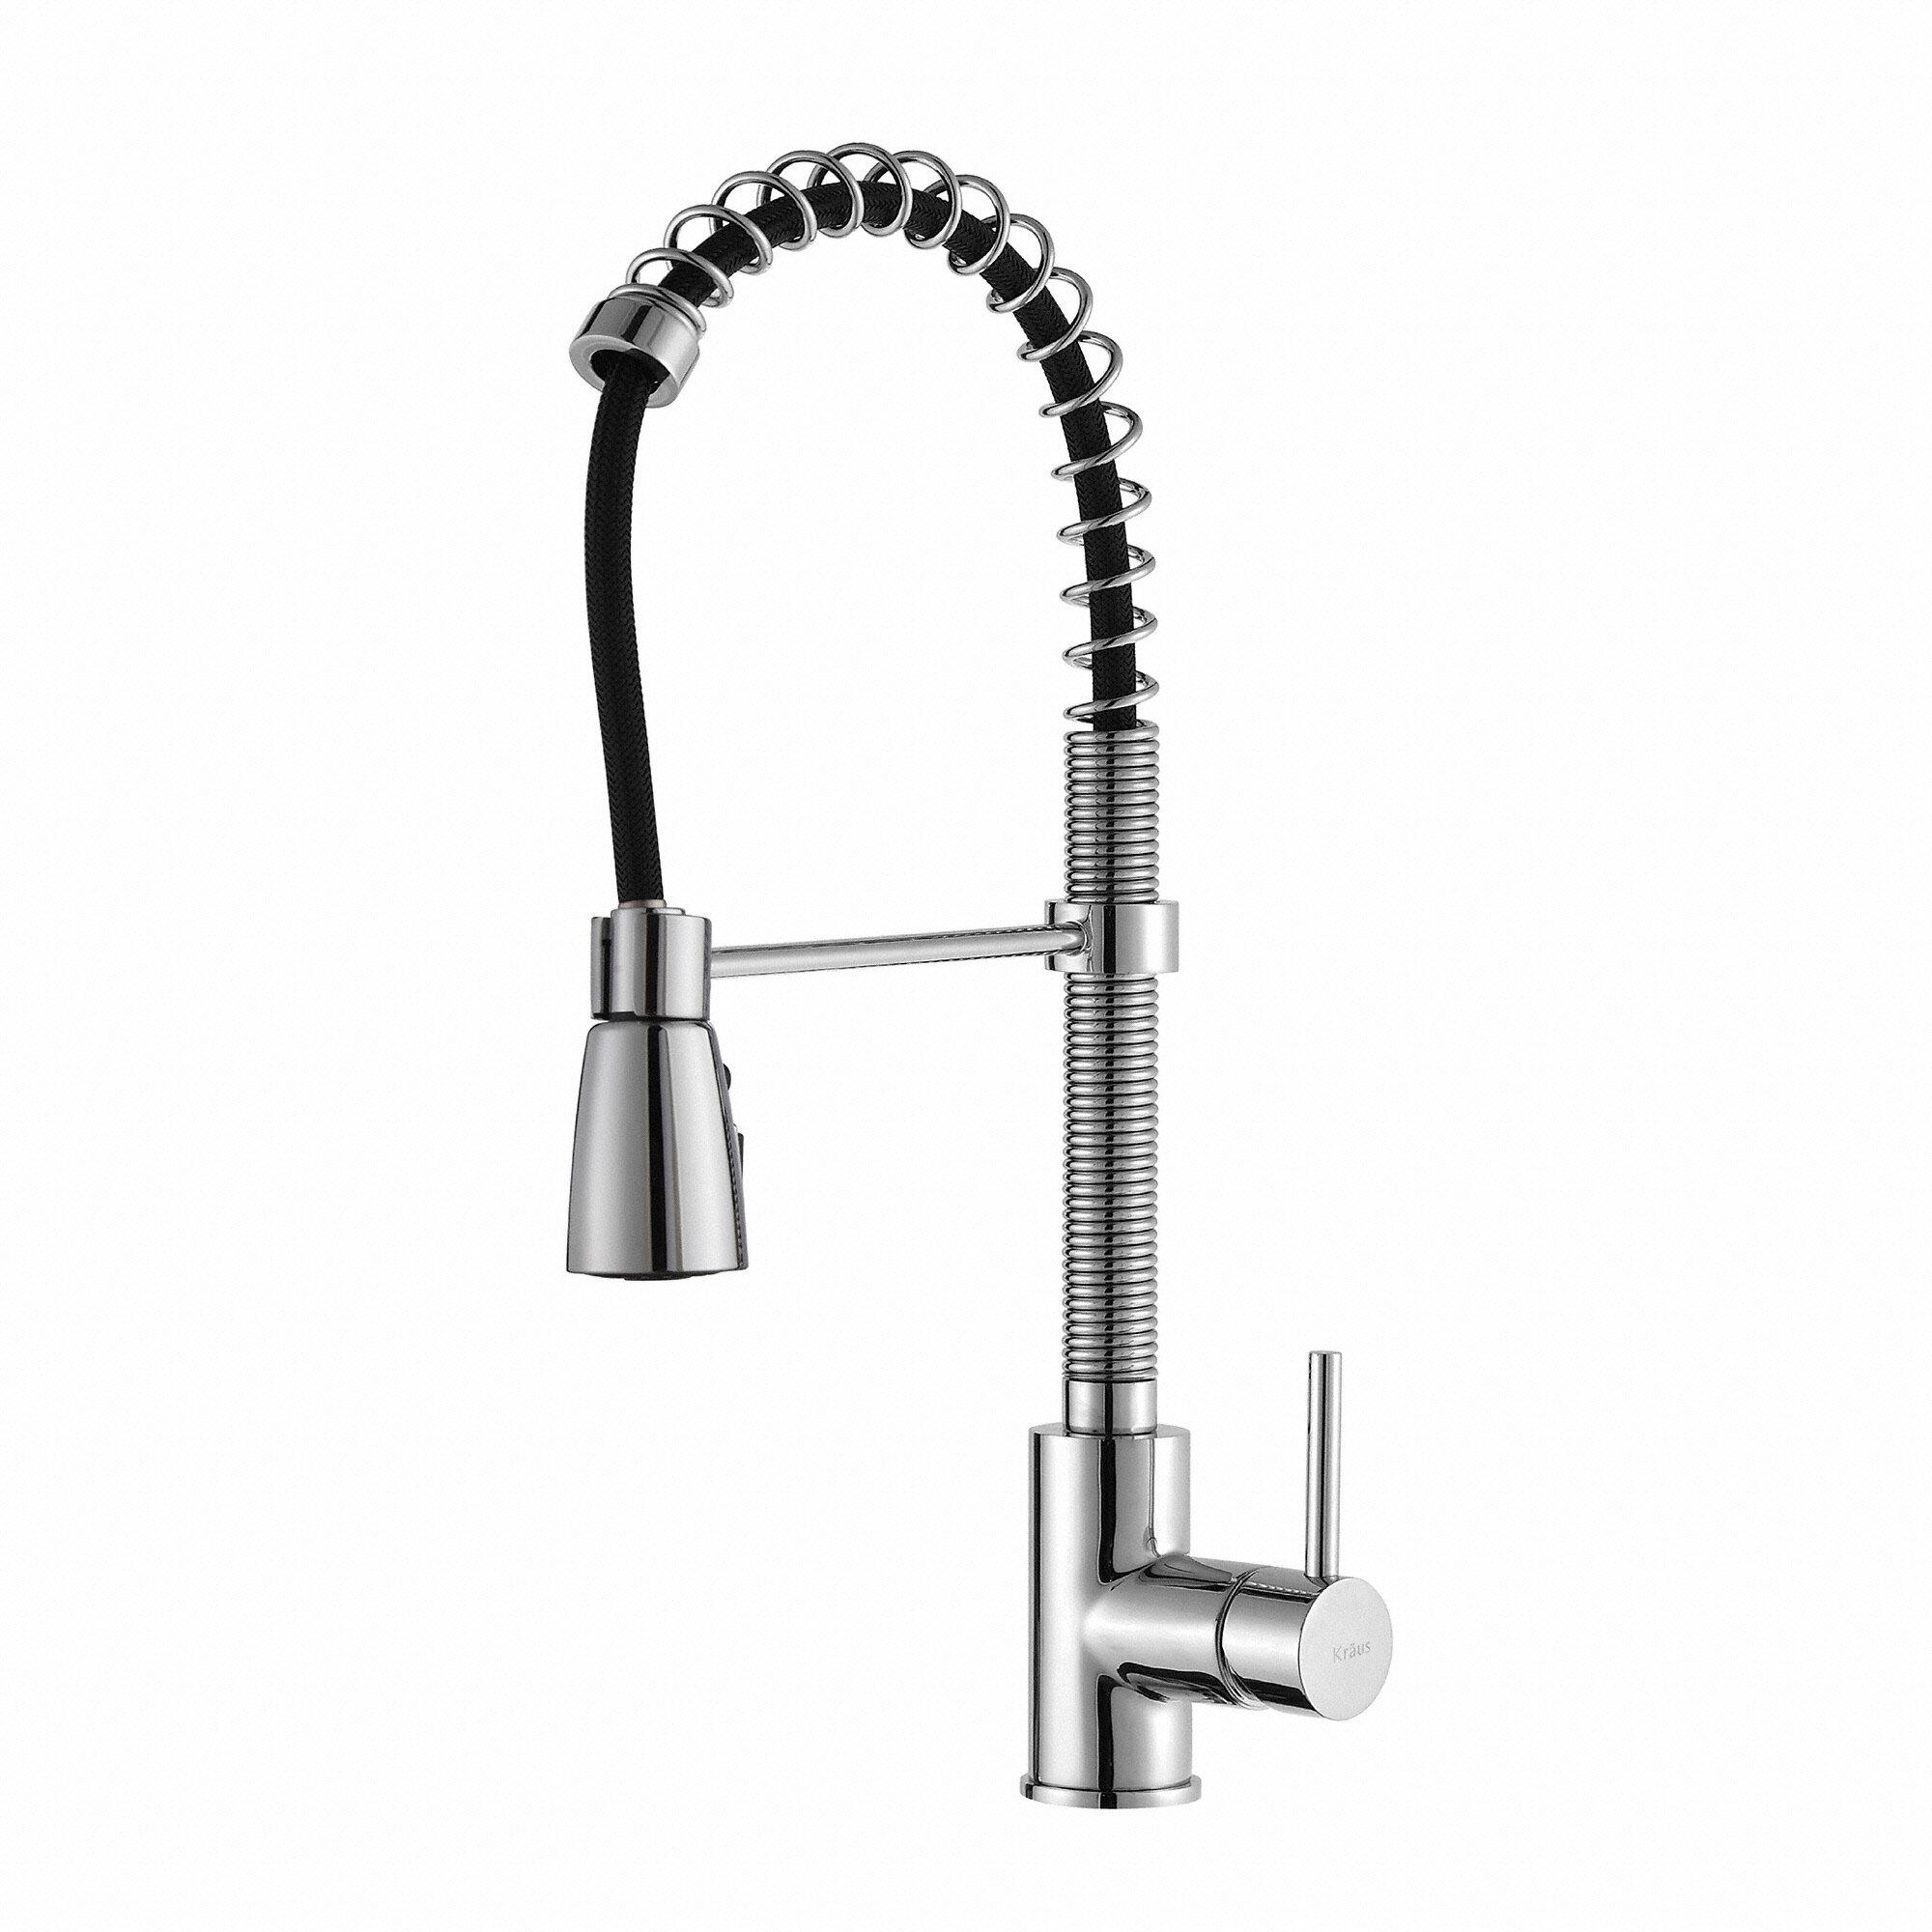 Kraus Pull Down Single Handle Kitchen Faucet & Reviews | Wayfair